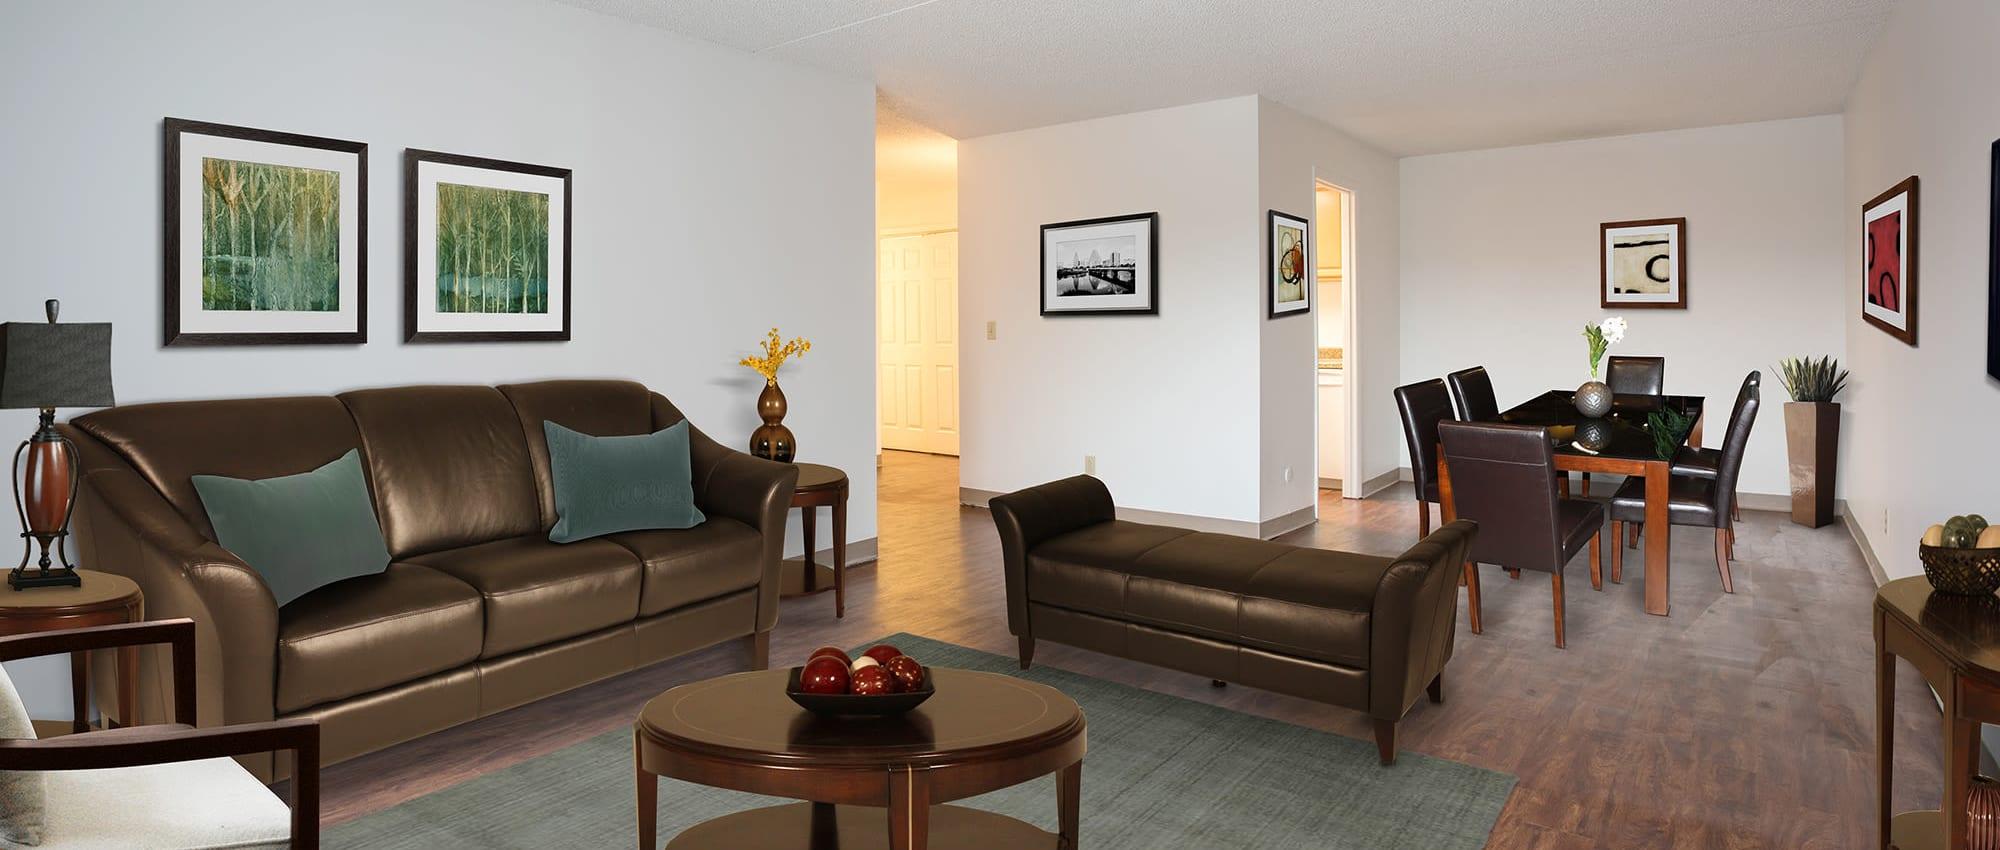 Apartments at Park Guilderland Apartments in Guilderland Center, New York